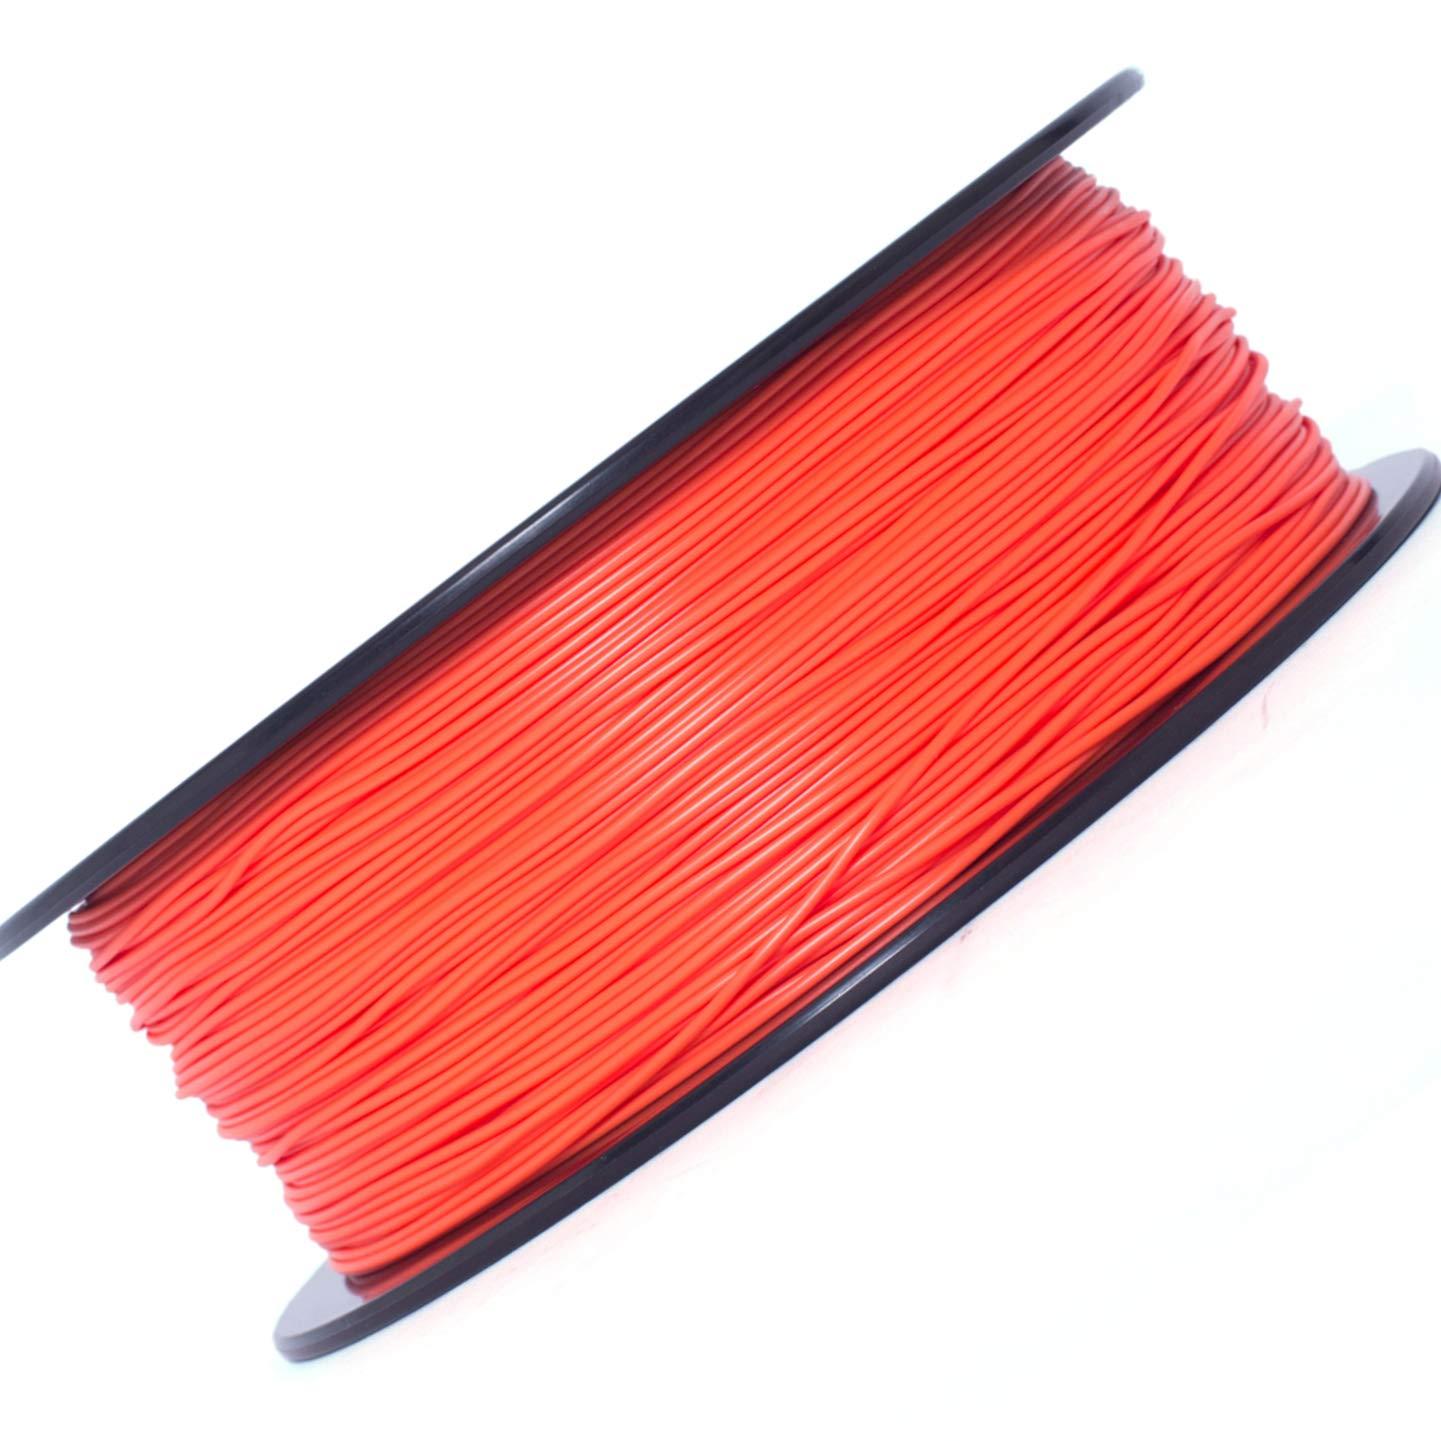 Filamento TPU 1.75mm 1kg COLOR FOTO-1 IMP 3D [7S6MBBHN]